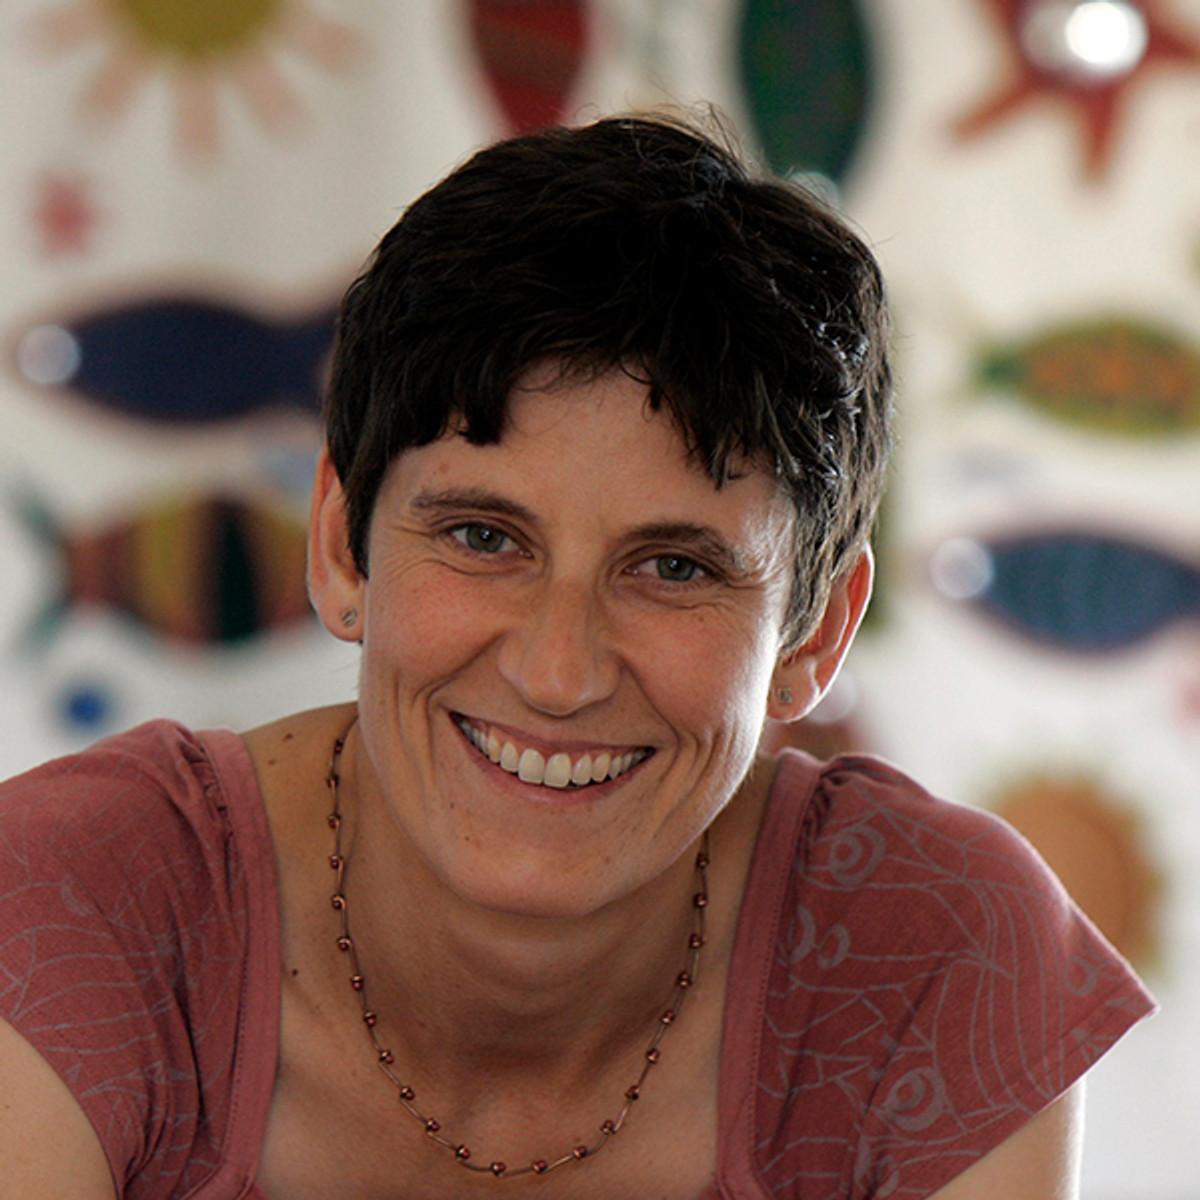 Sarah Broom